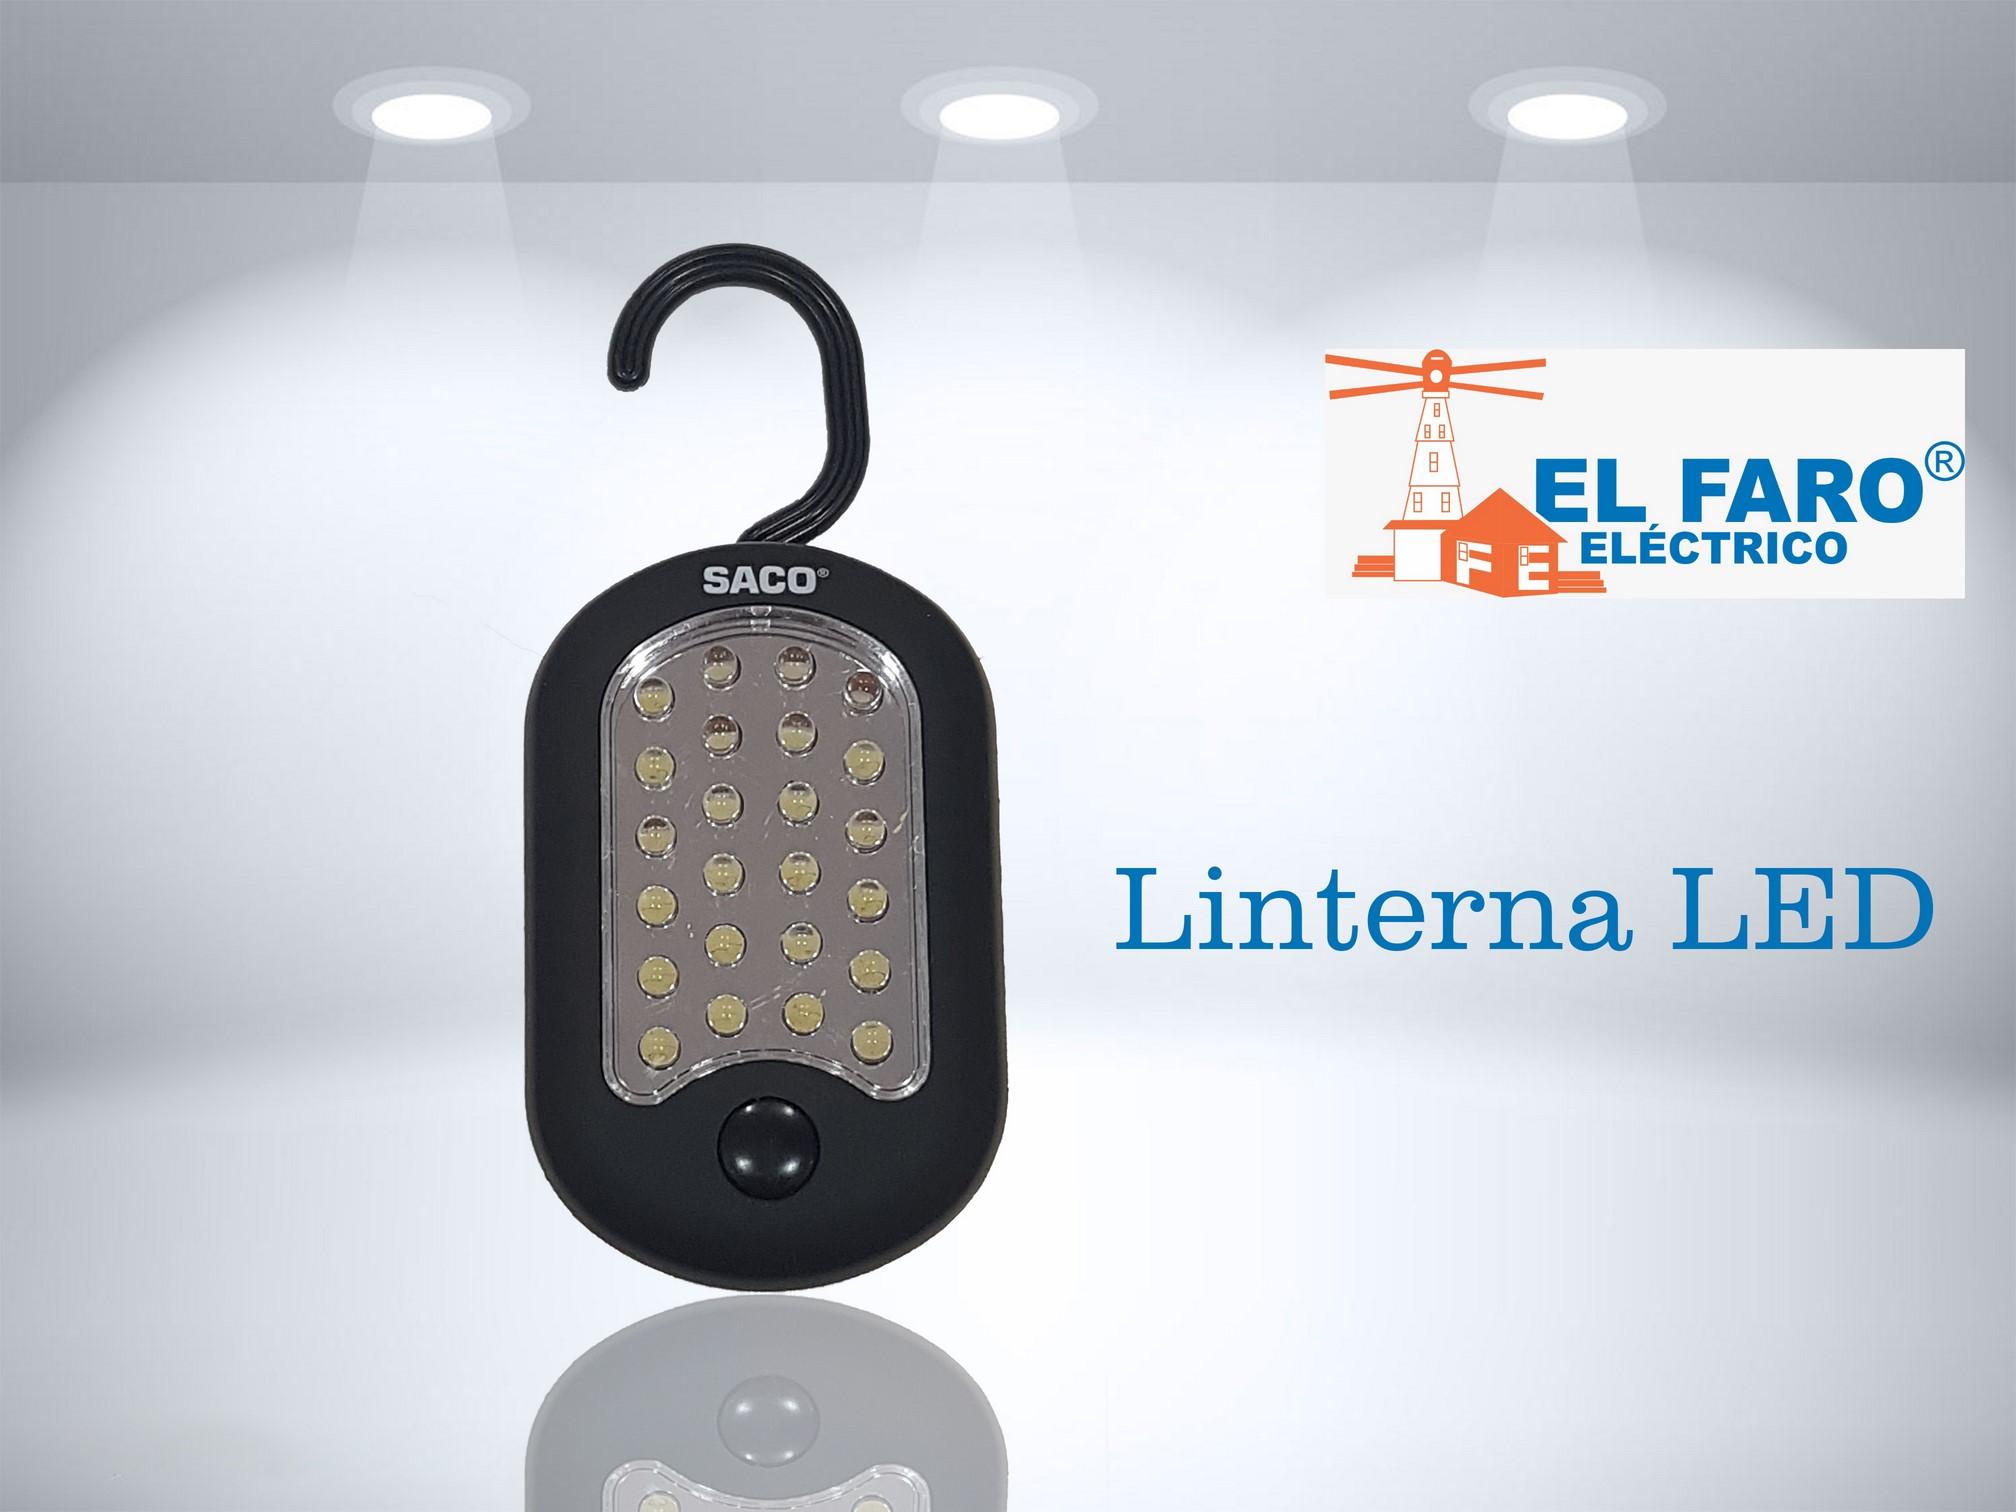 linterna LED